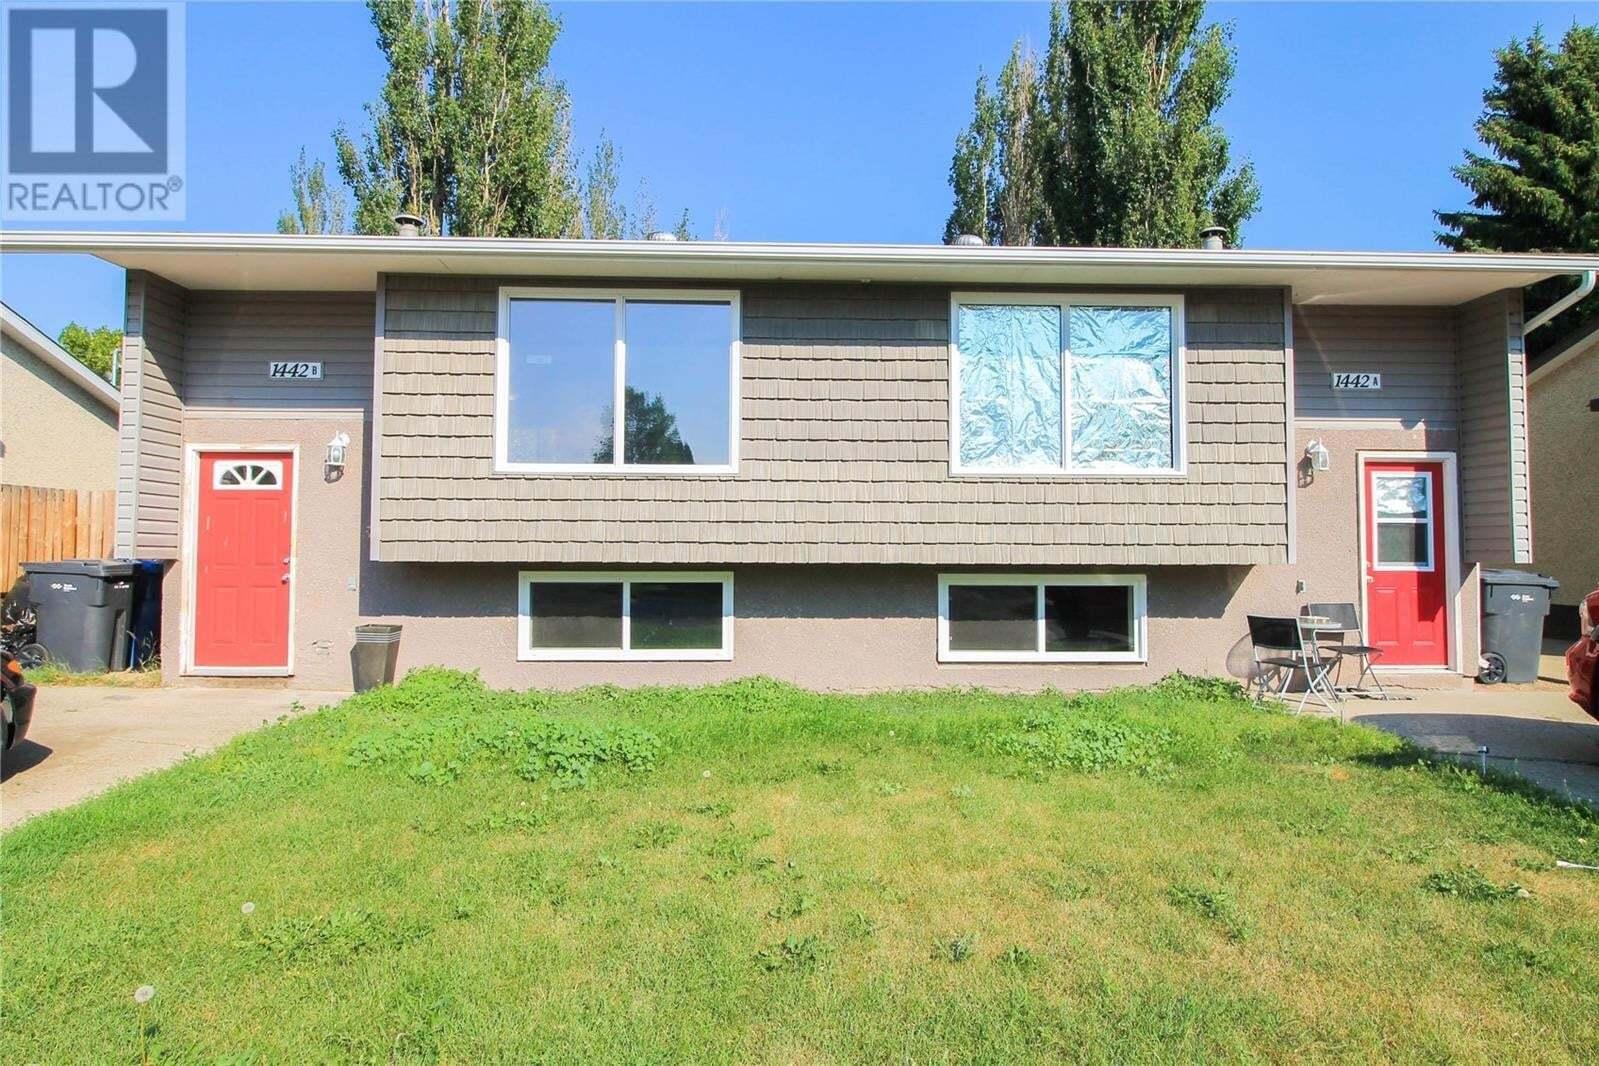 Townhouse for sale at 1442 111th St North Battleford Saskatchewan - MLS: SK823653